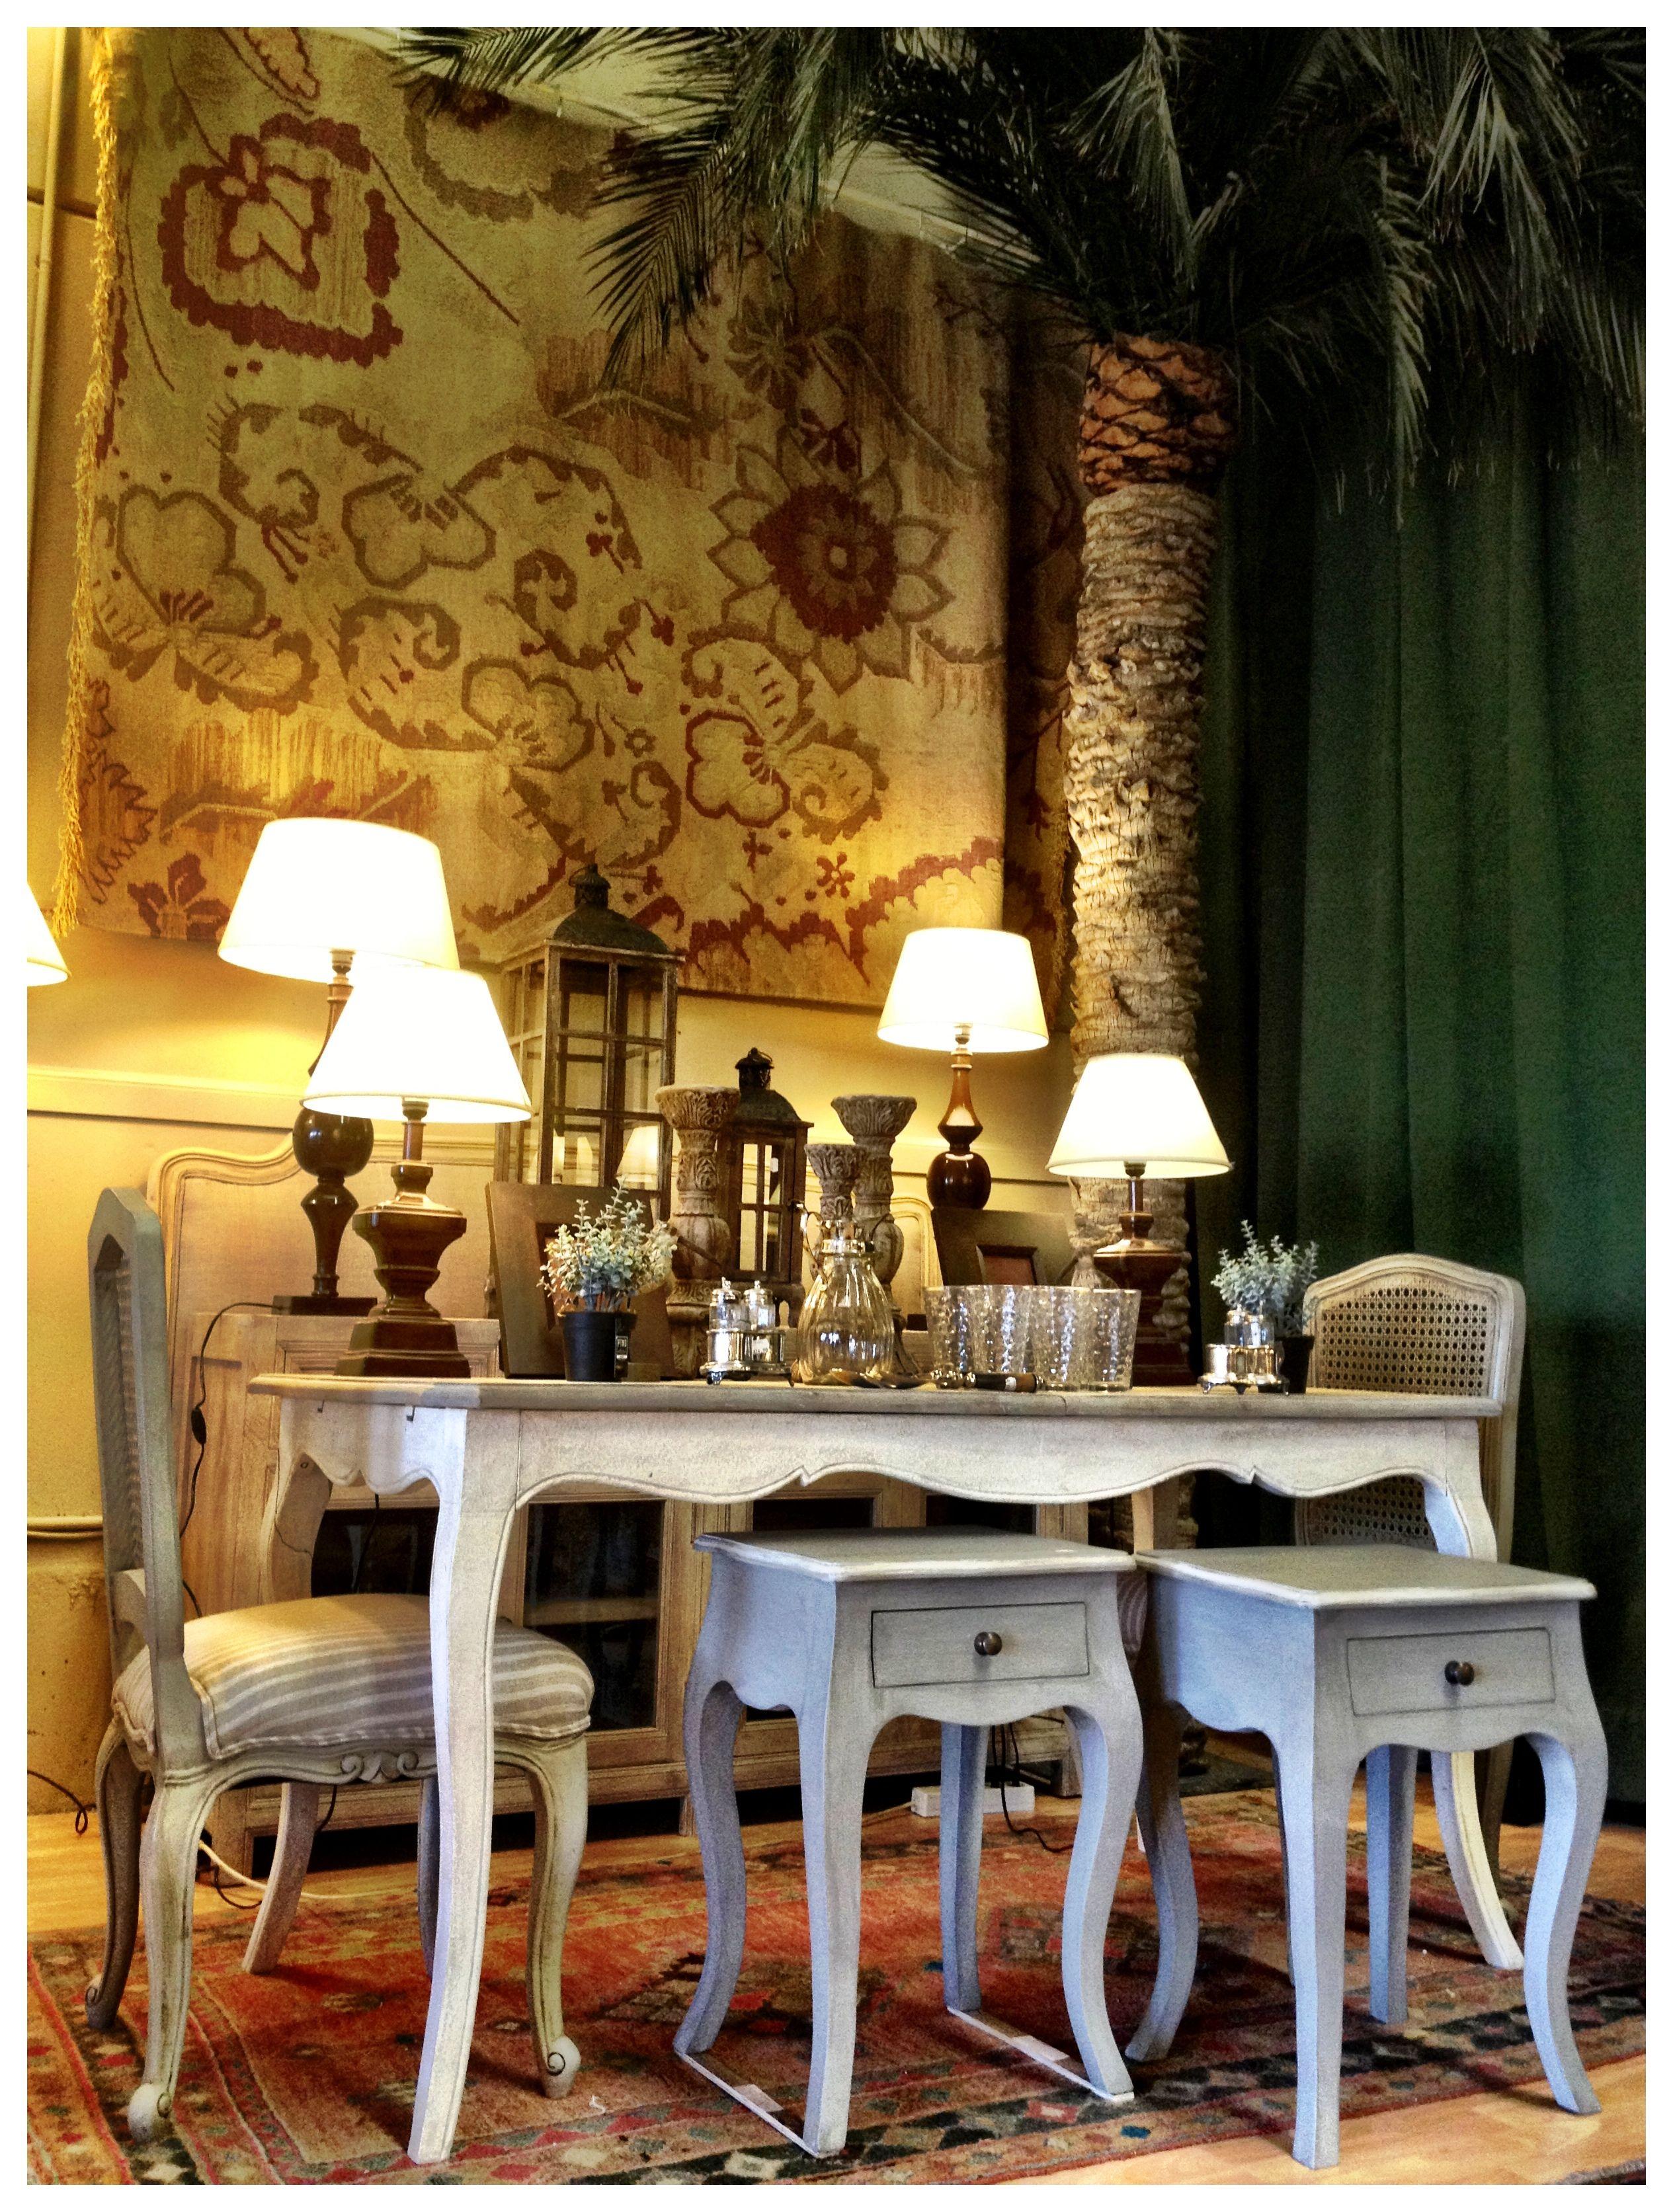 Borgia Conti Decoraci N Madrid Www Borgiaconti Com Shop Online  ~ Tiendas De Decoraciã³n En Madrid